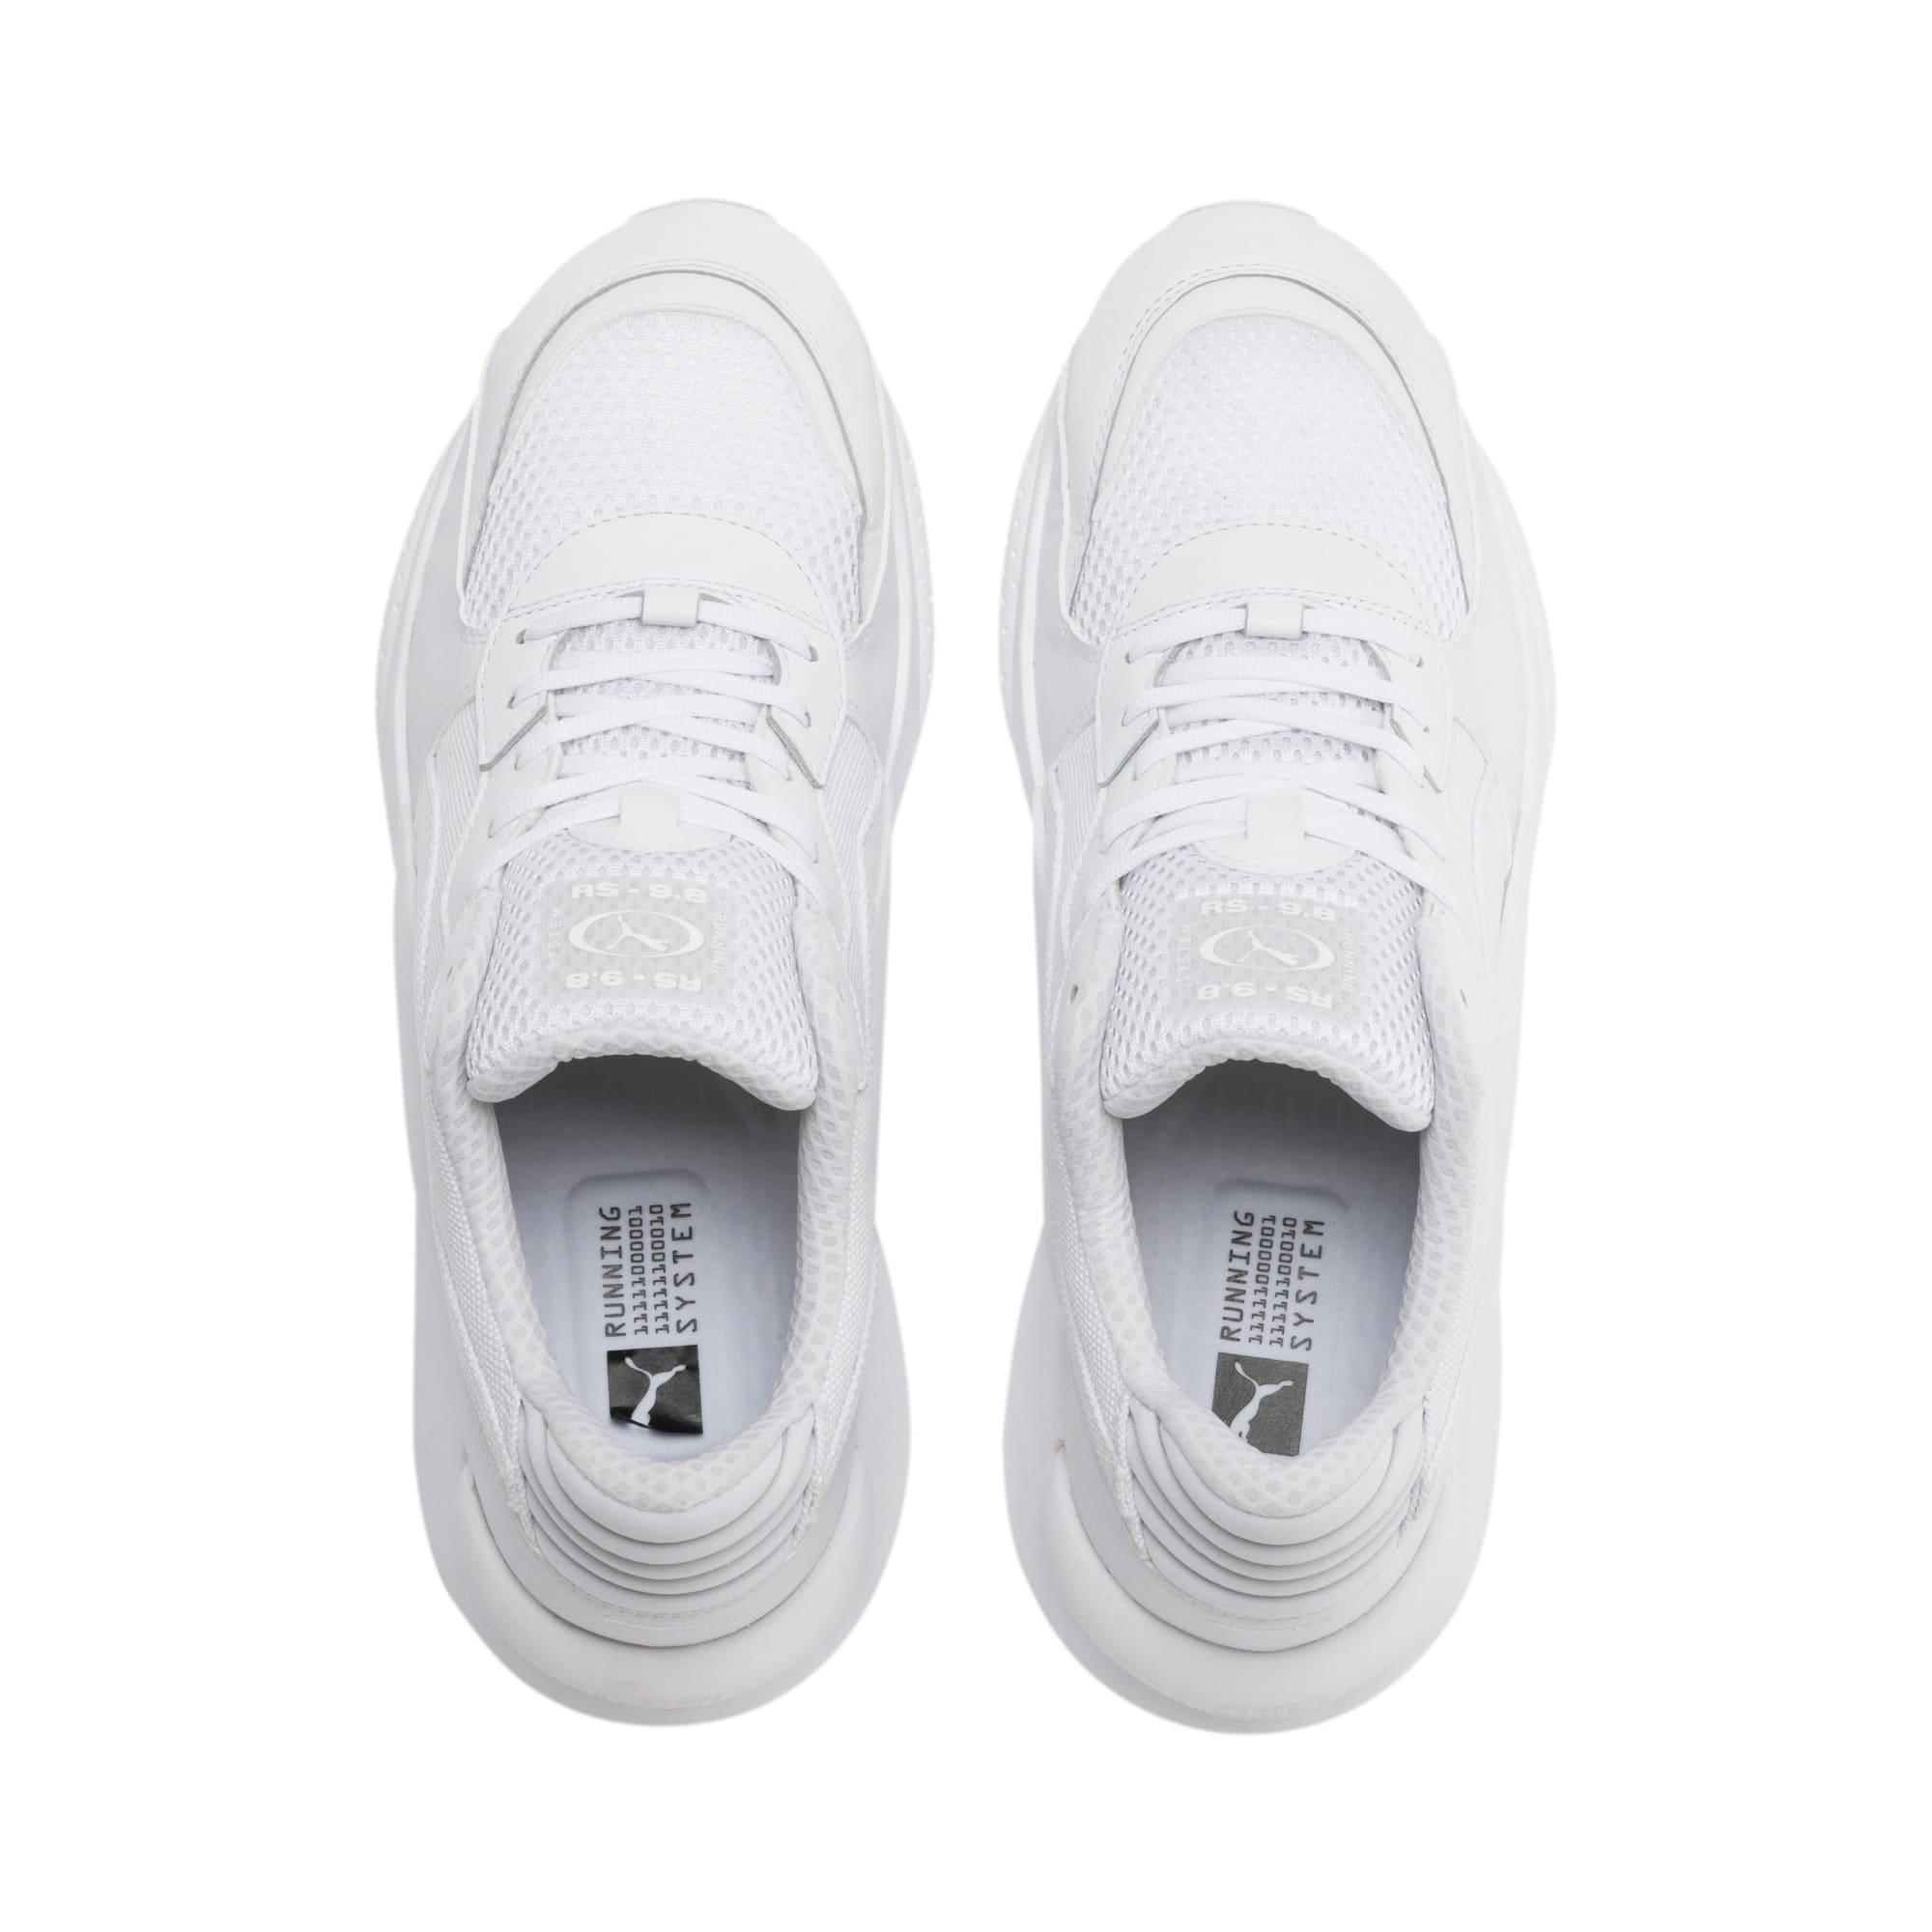 Thumbnail 6 of RS 9.8 Sneaker, Puma White, medium